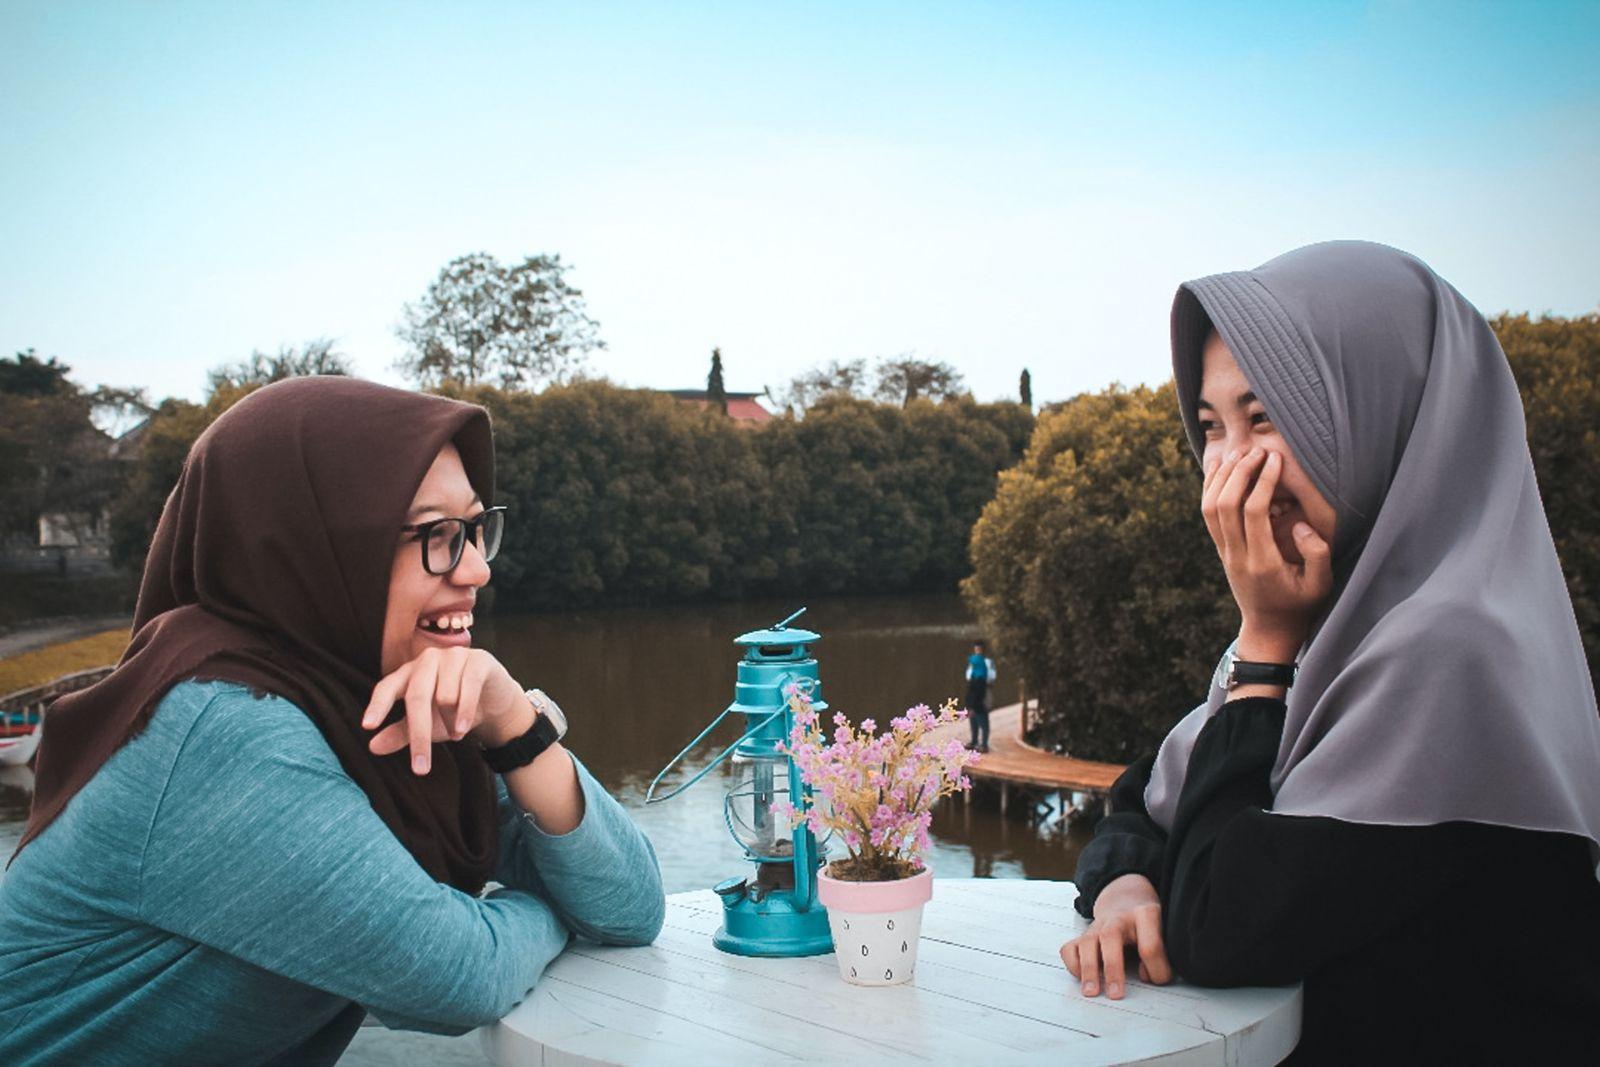 calm public speaking nerves - speak to one person